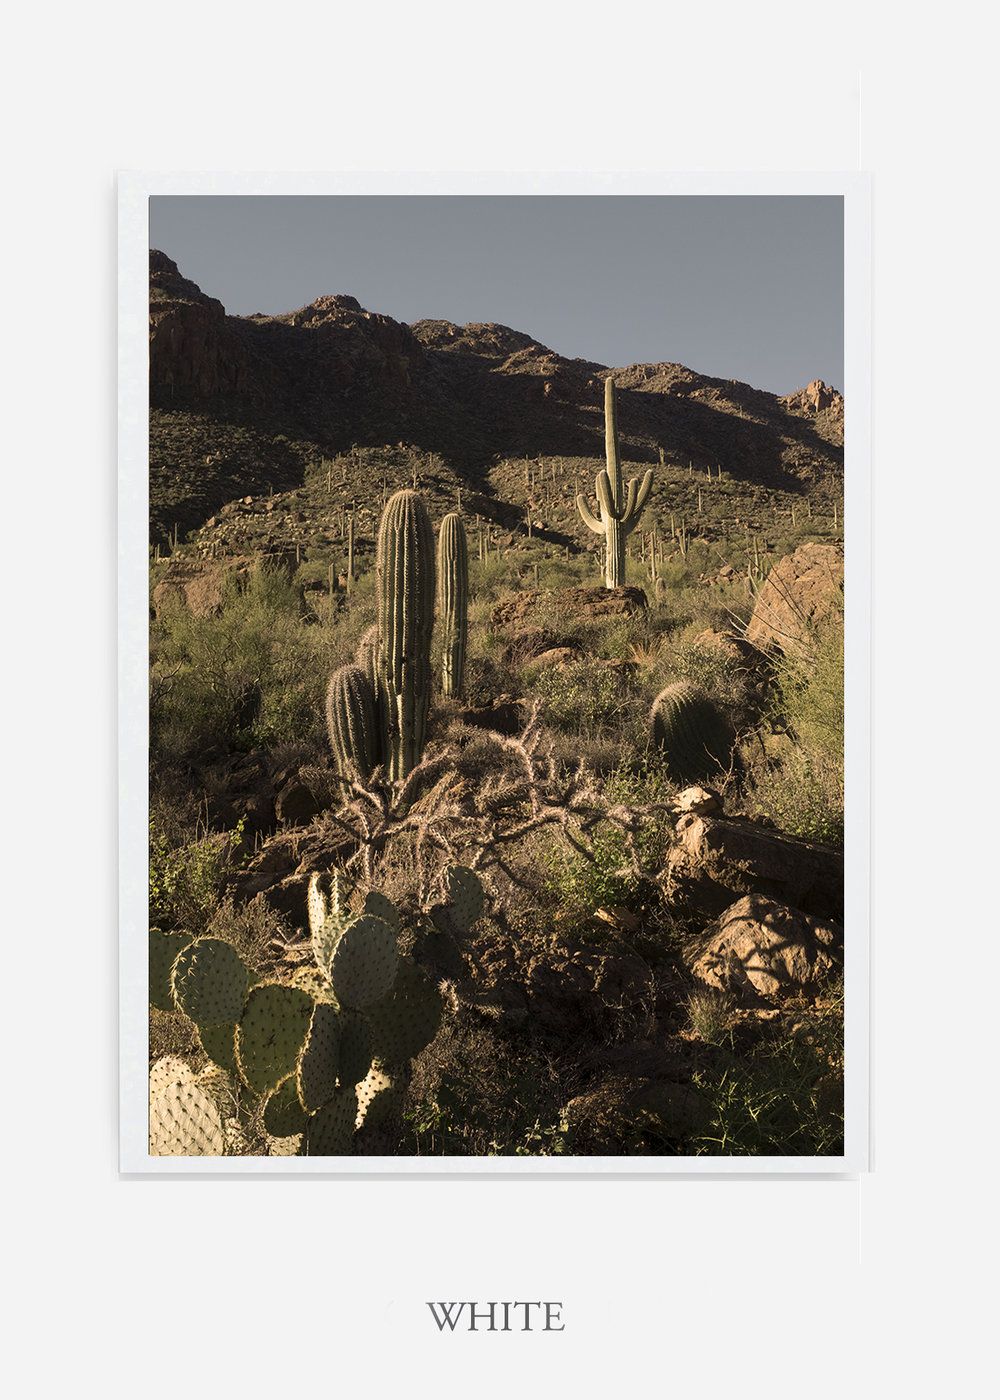 nomat-whiteframe-saguaroNo.18-wildercalifornia-art-wallart-cactusprint-homedecor-prints-arizona-botanical-artwork-interiordesign.jpg